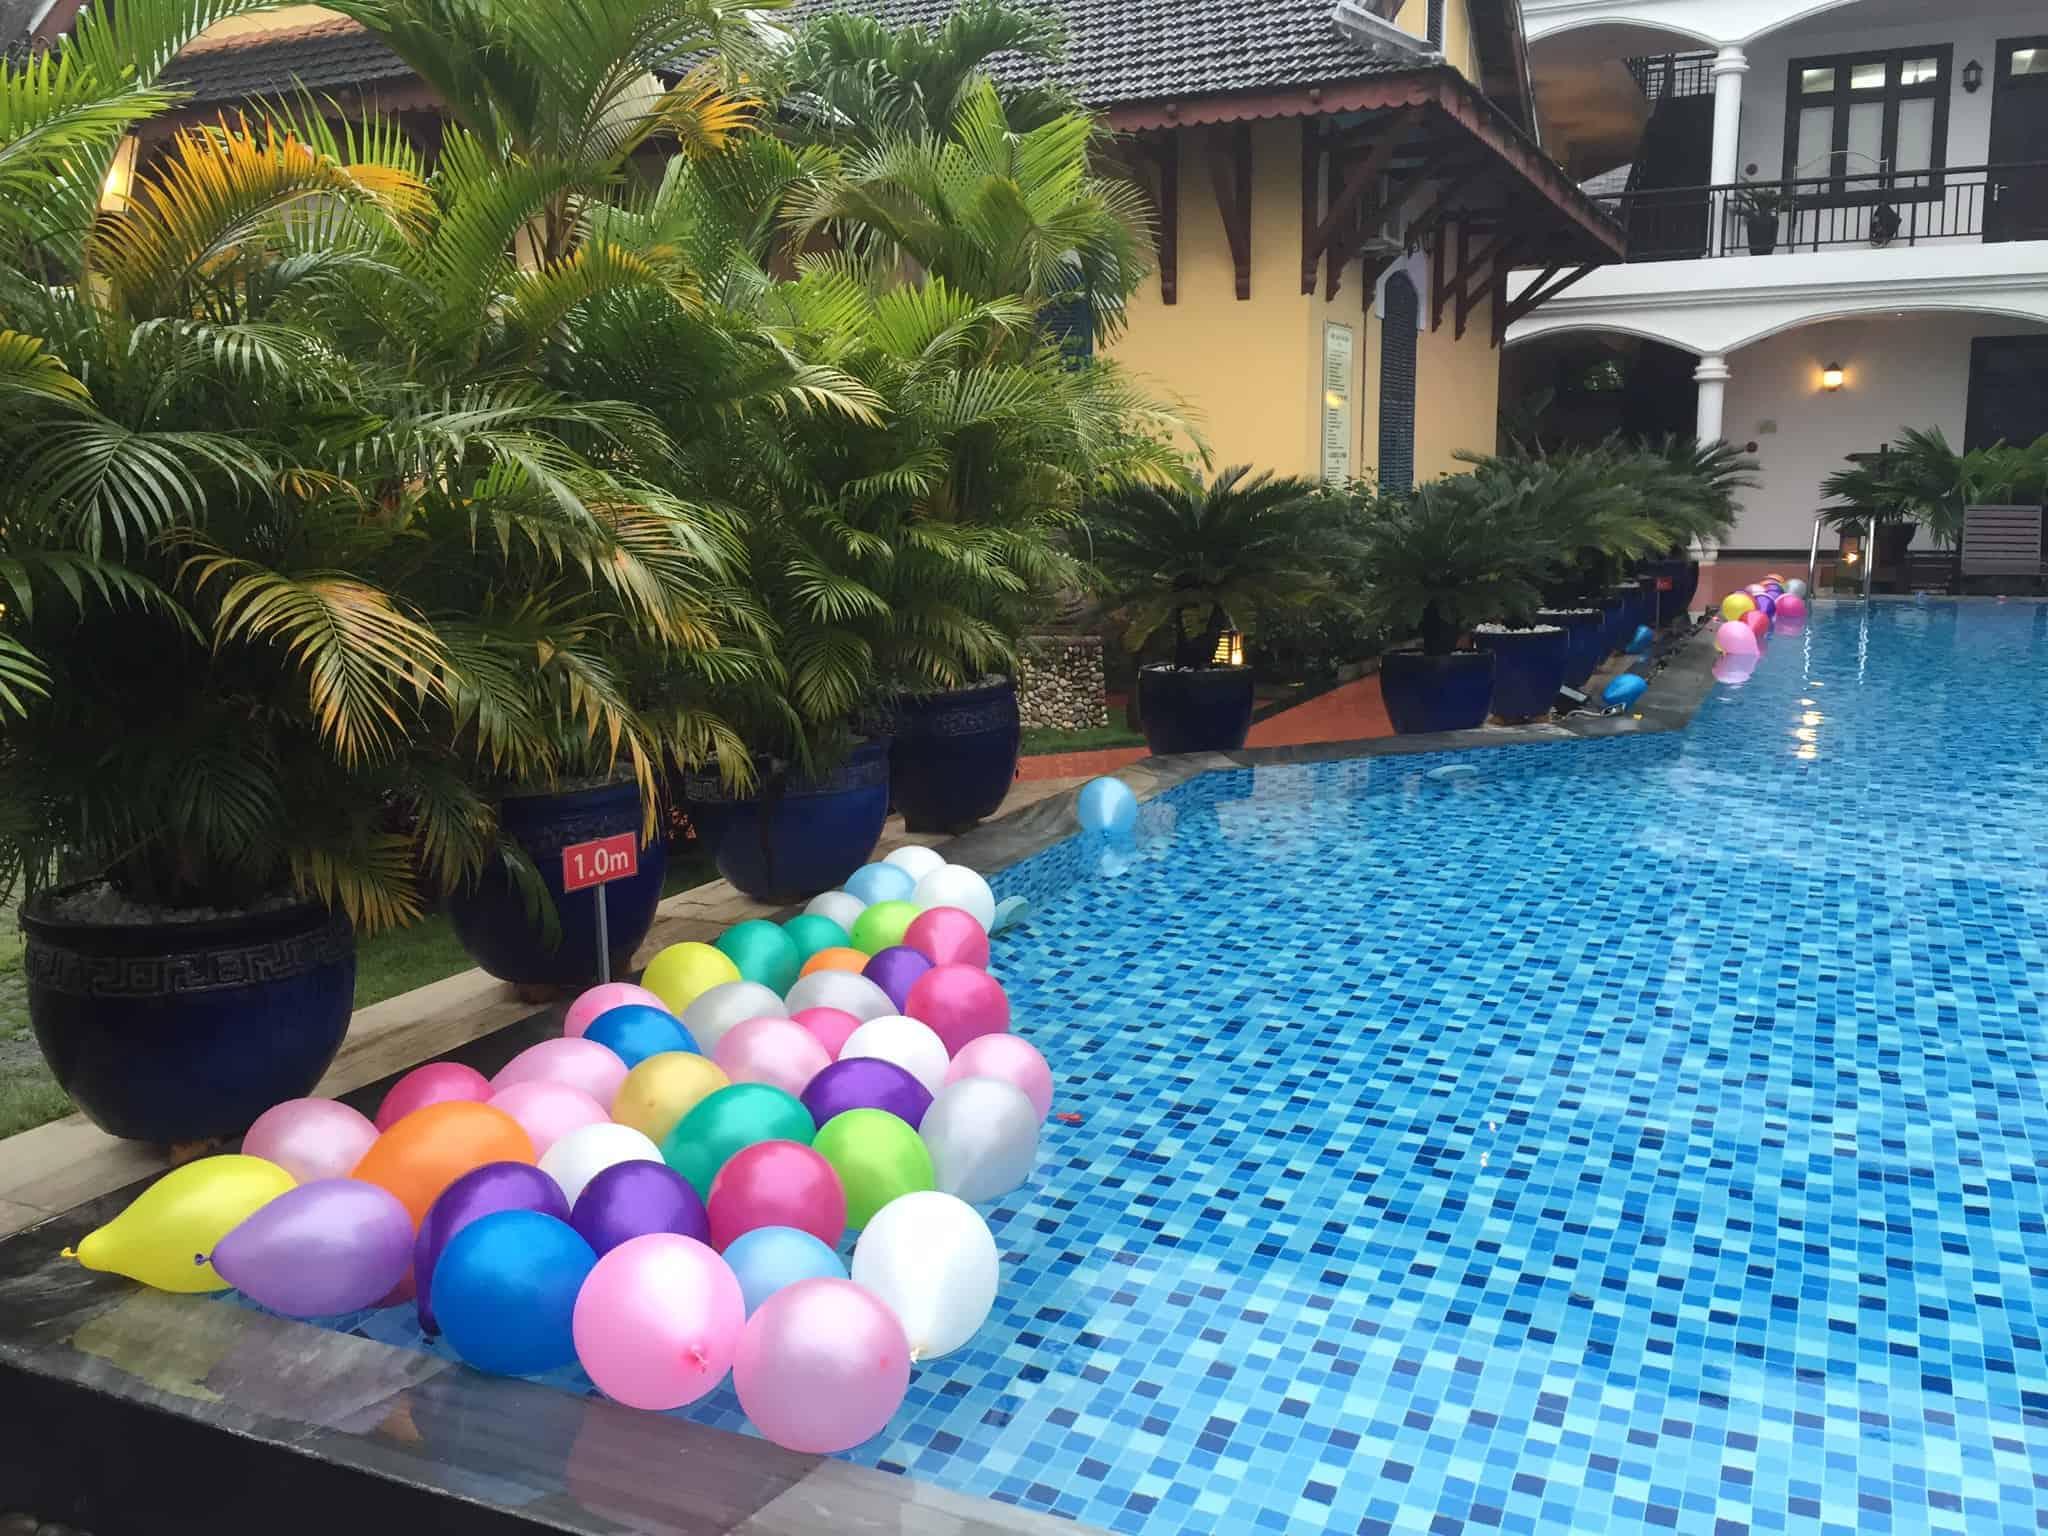 Pool-party - sikke en sjov bryllupsfest